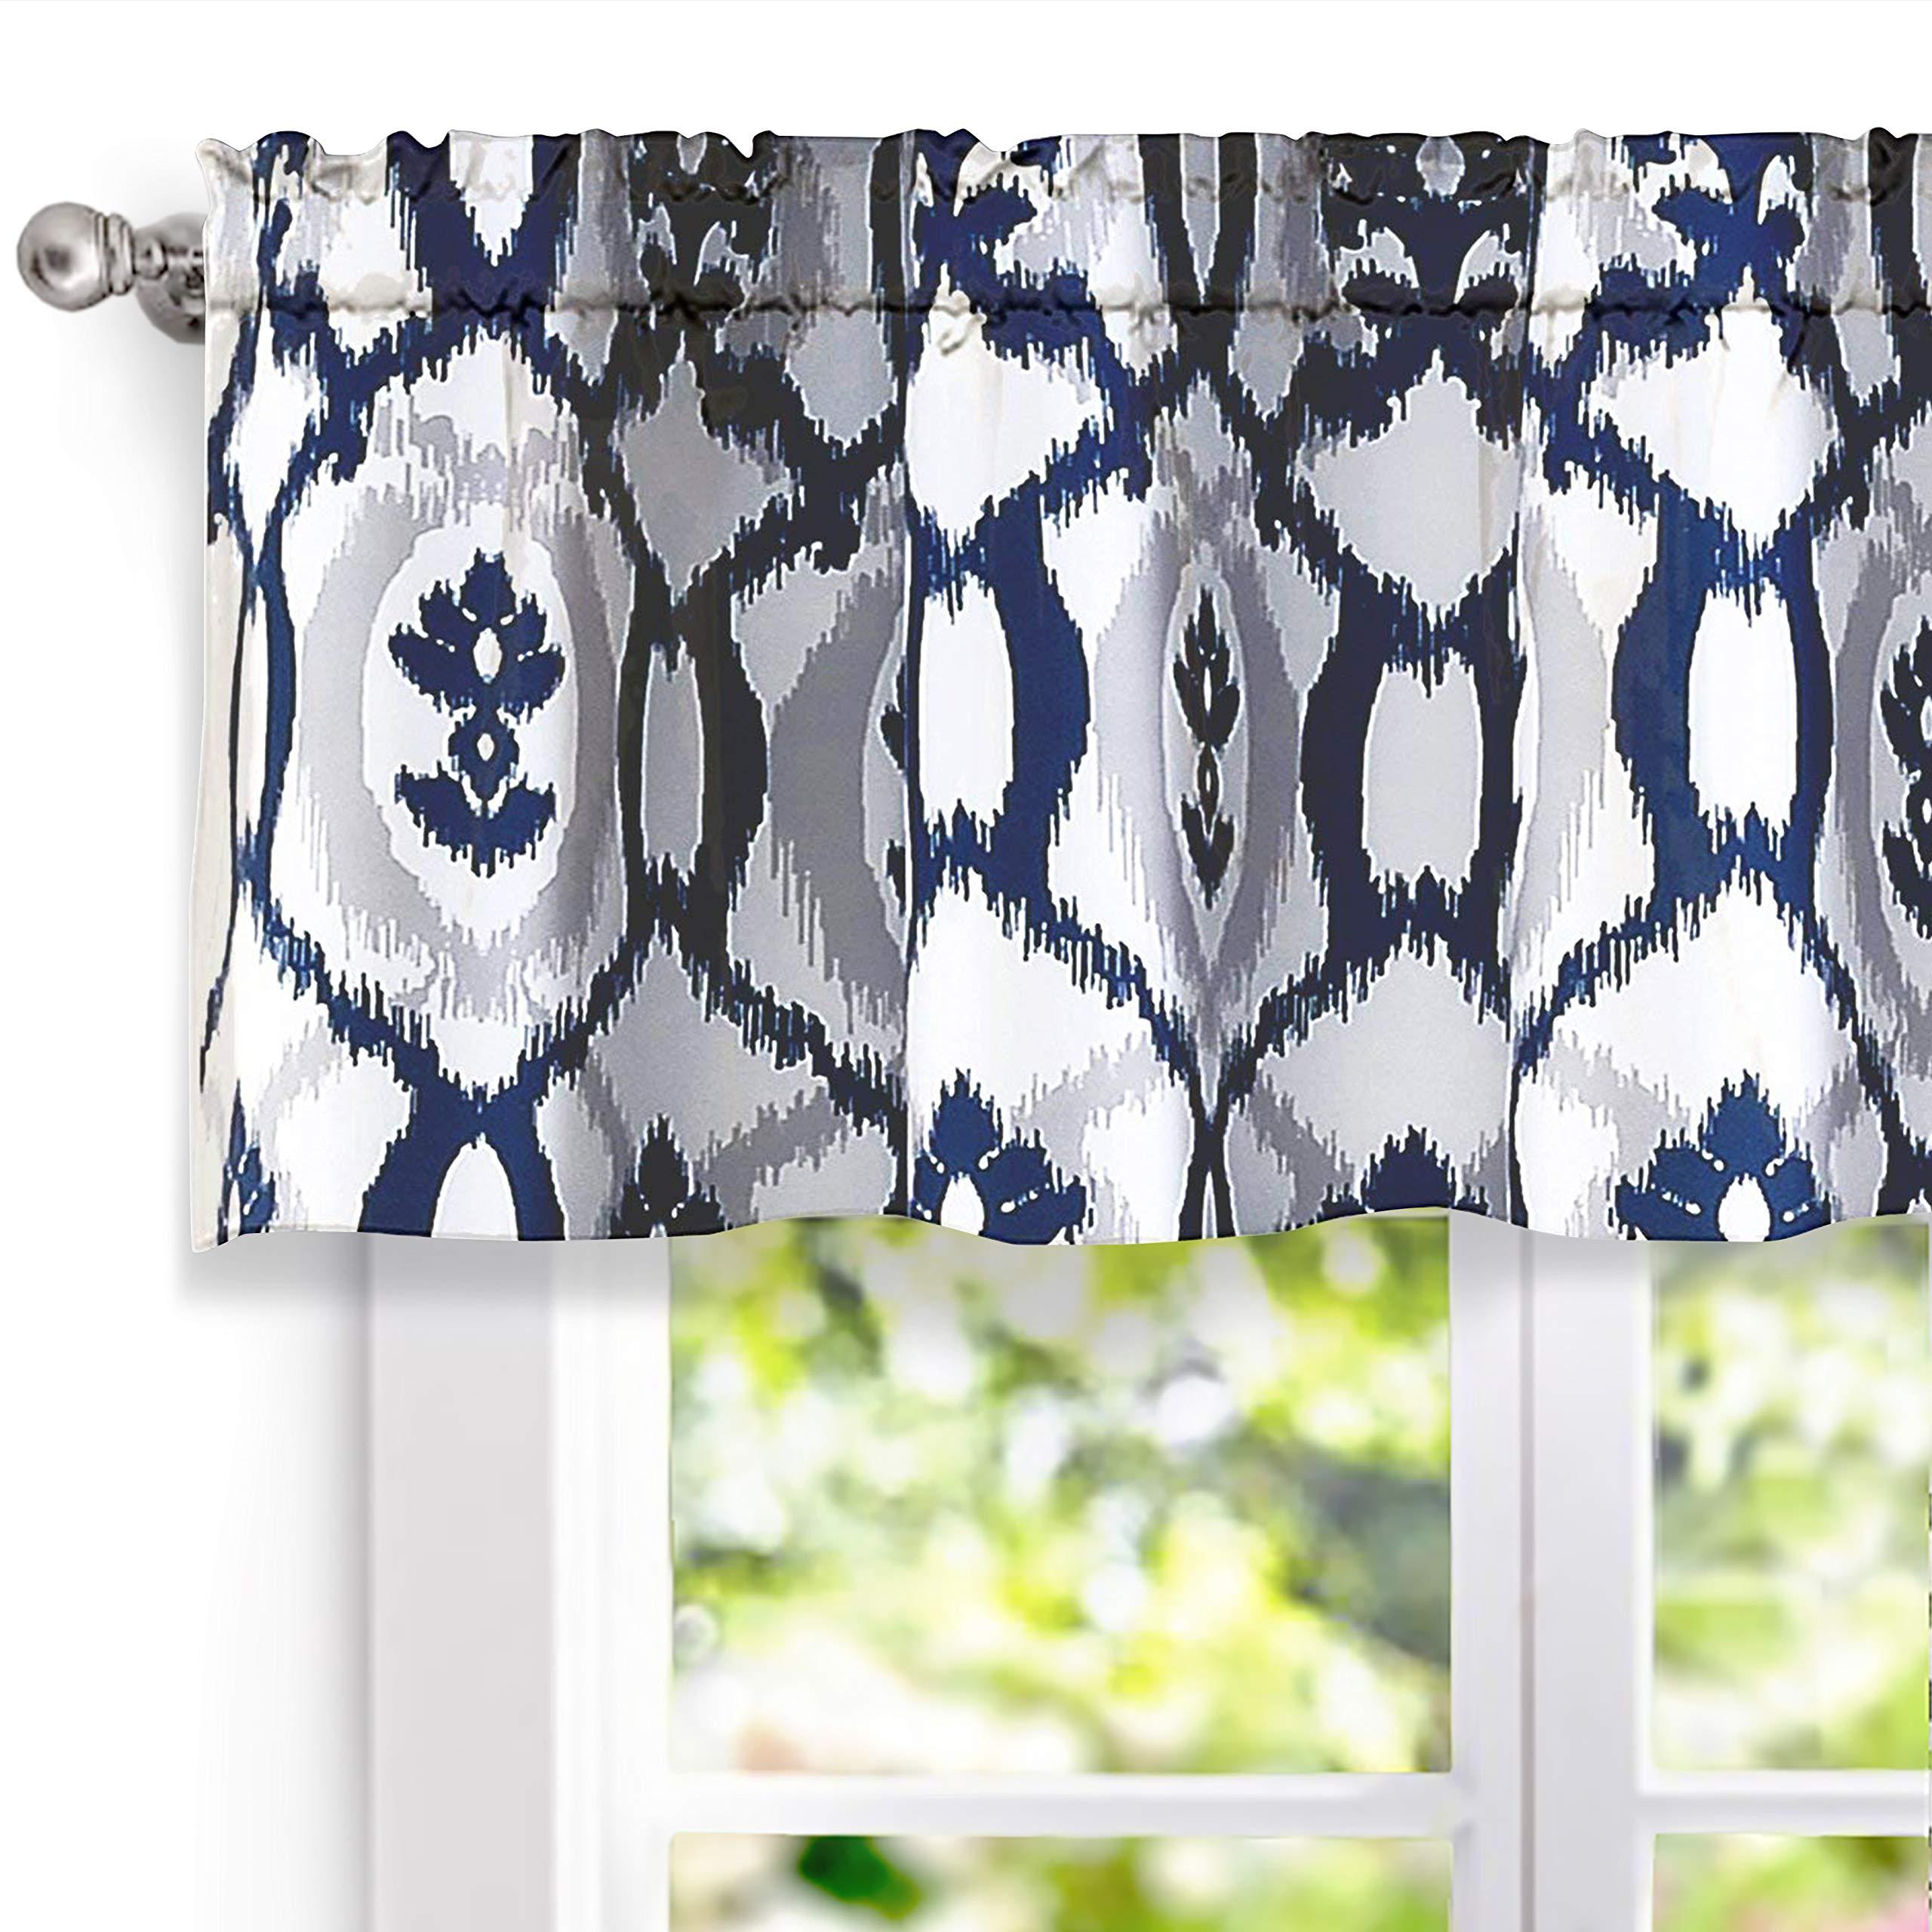 DriftAway Evelyn Ikat fleur/Floral Pattern Window Curtain Valance, 52''x18''(Navy Blue)